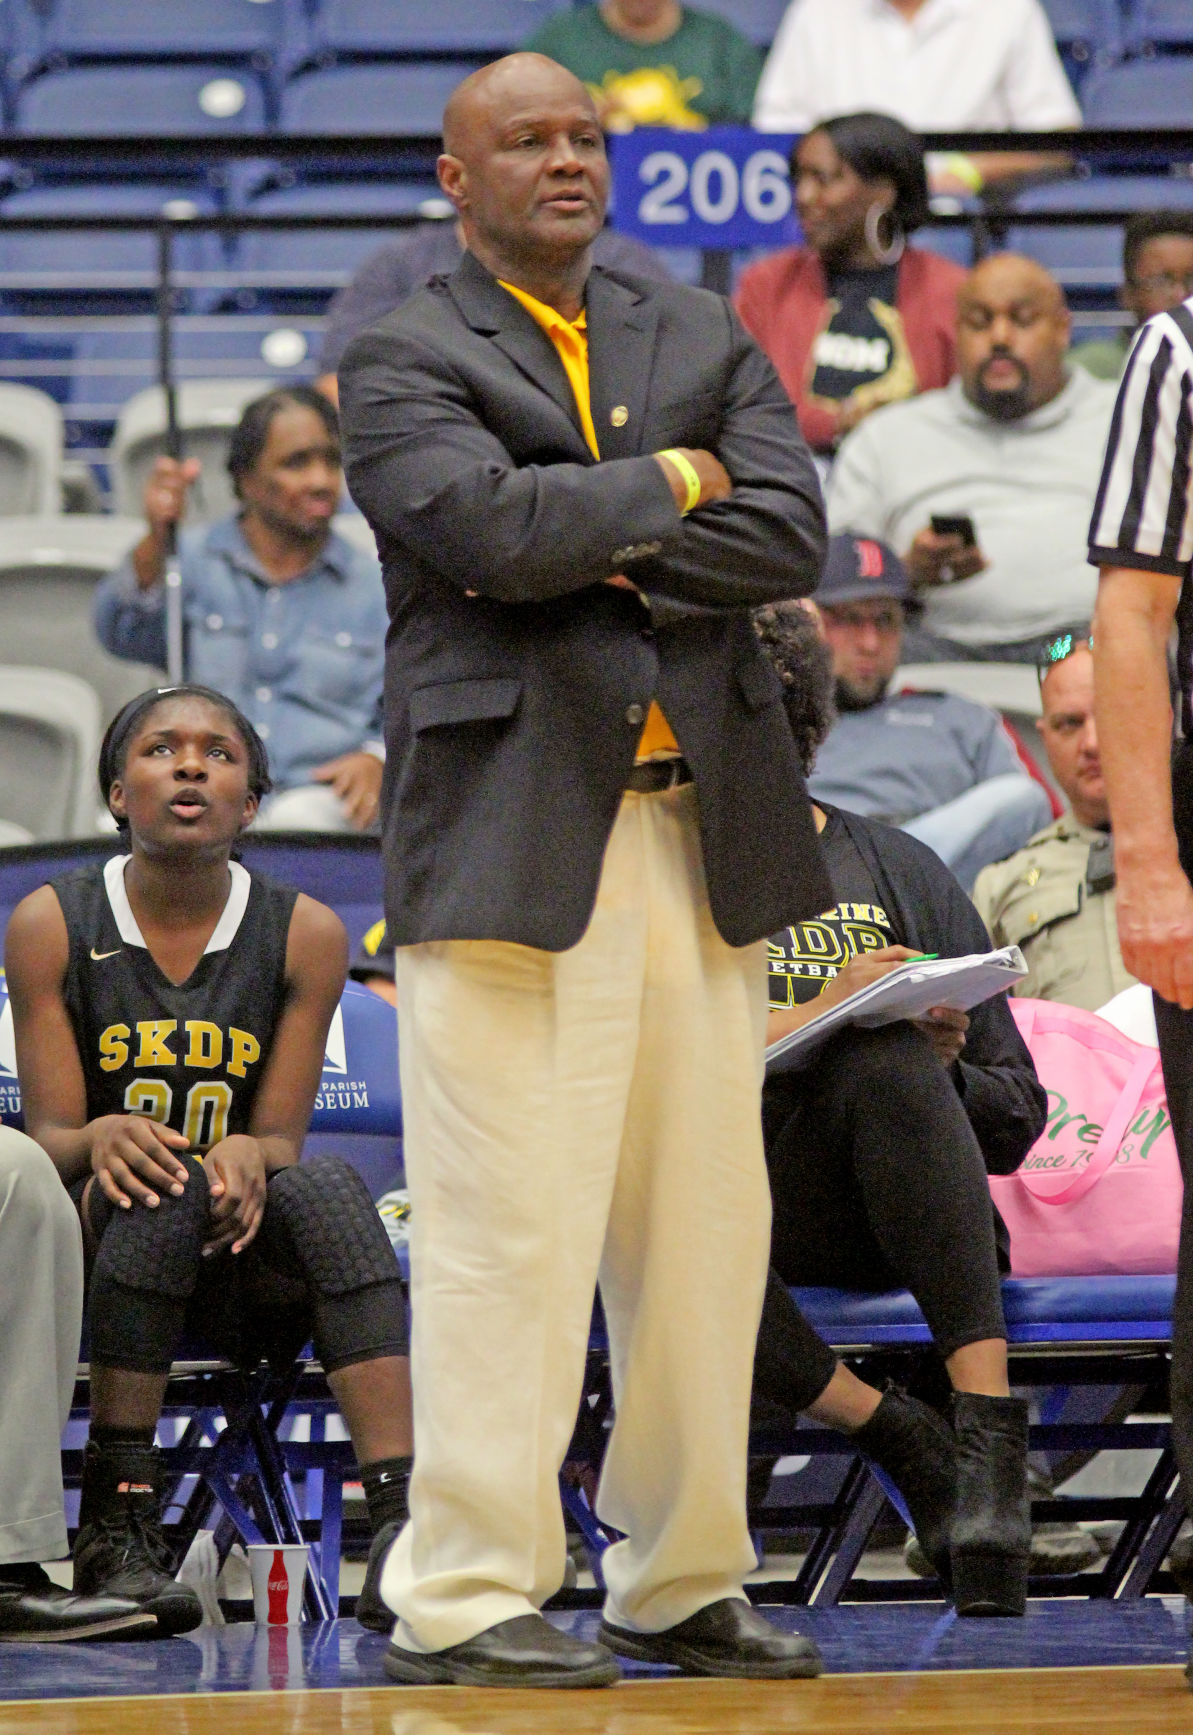 St. Katharine Drexel coach Terry Wilson